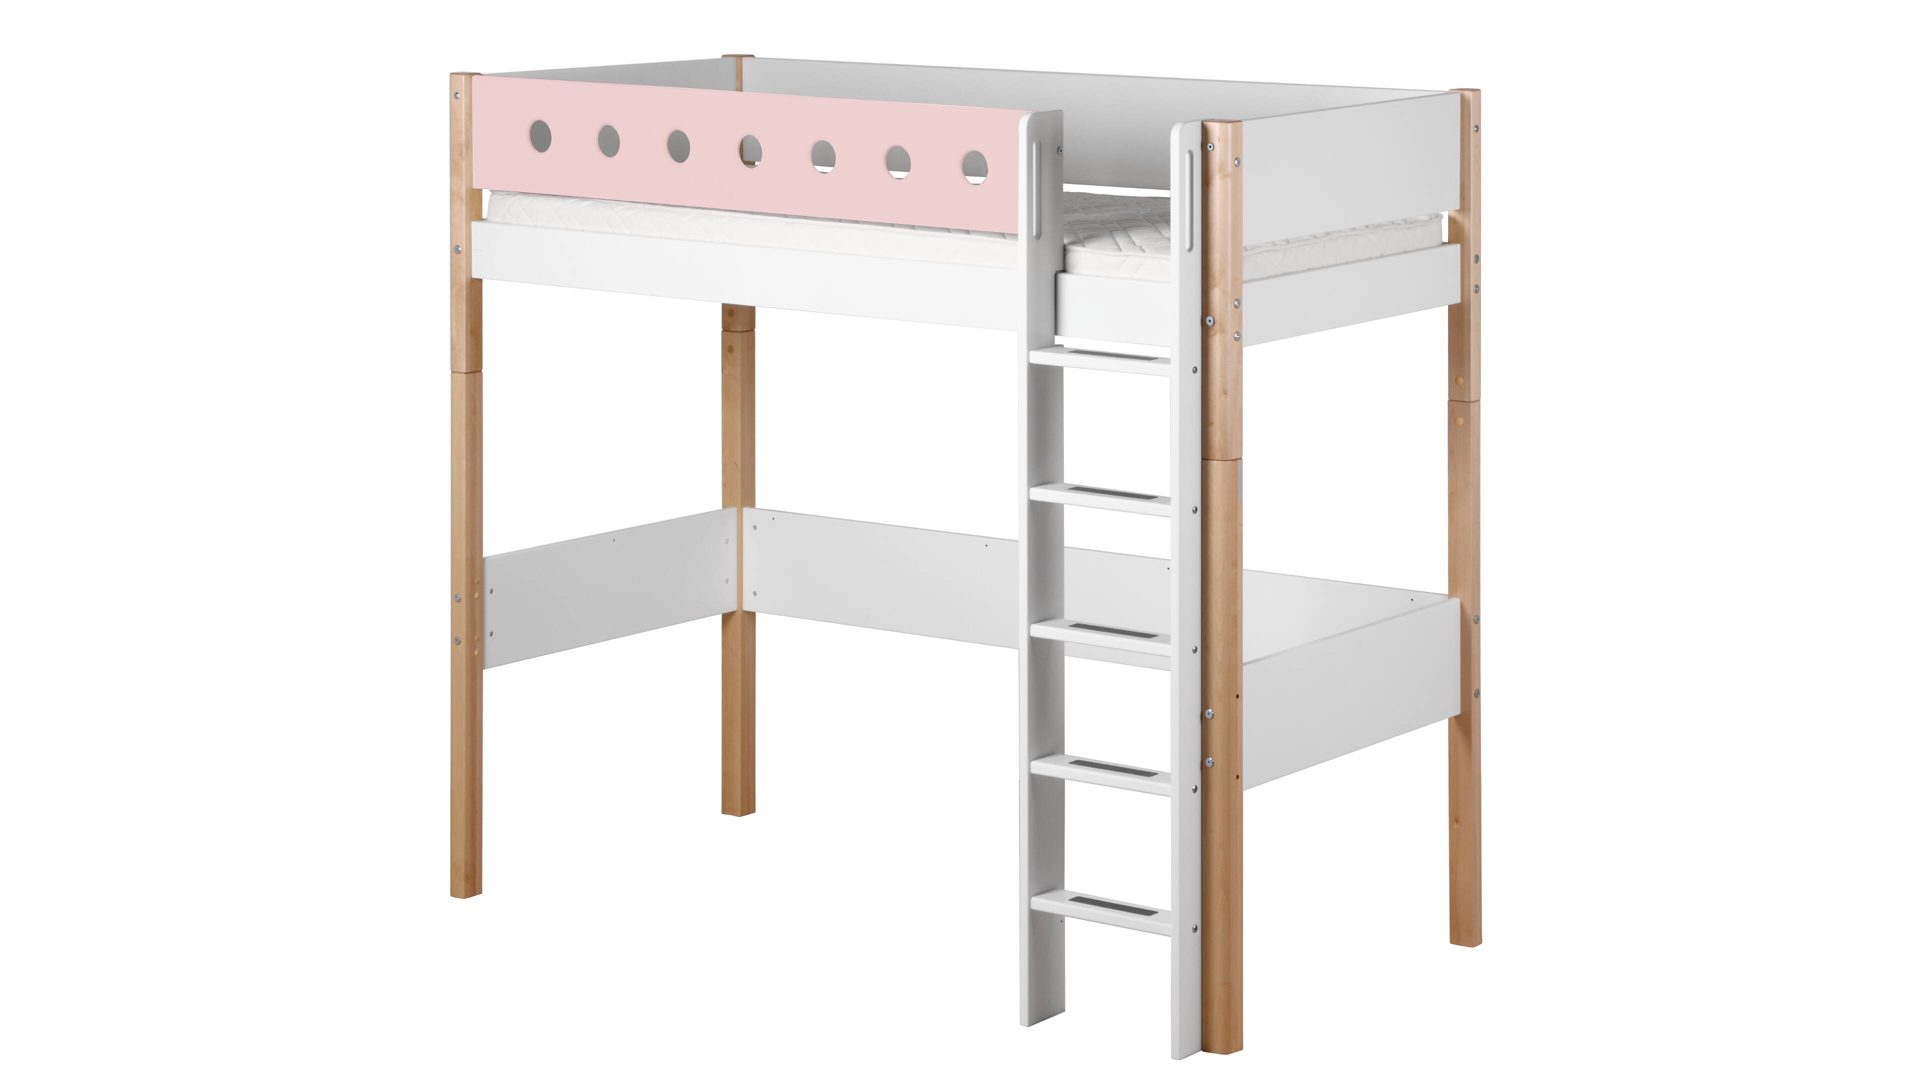 Hochbett Holz Weiß 90x200 : Halbhohes bett weiß beste produkte wei fabulous latest